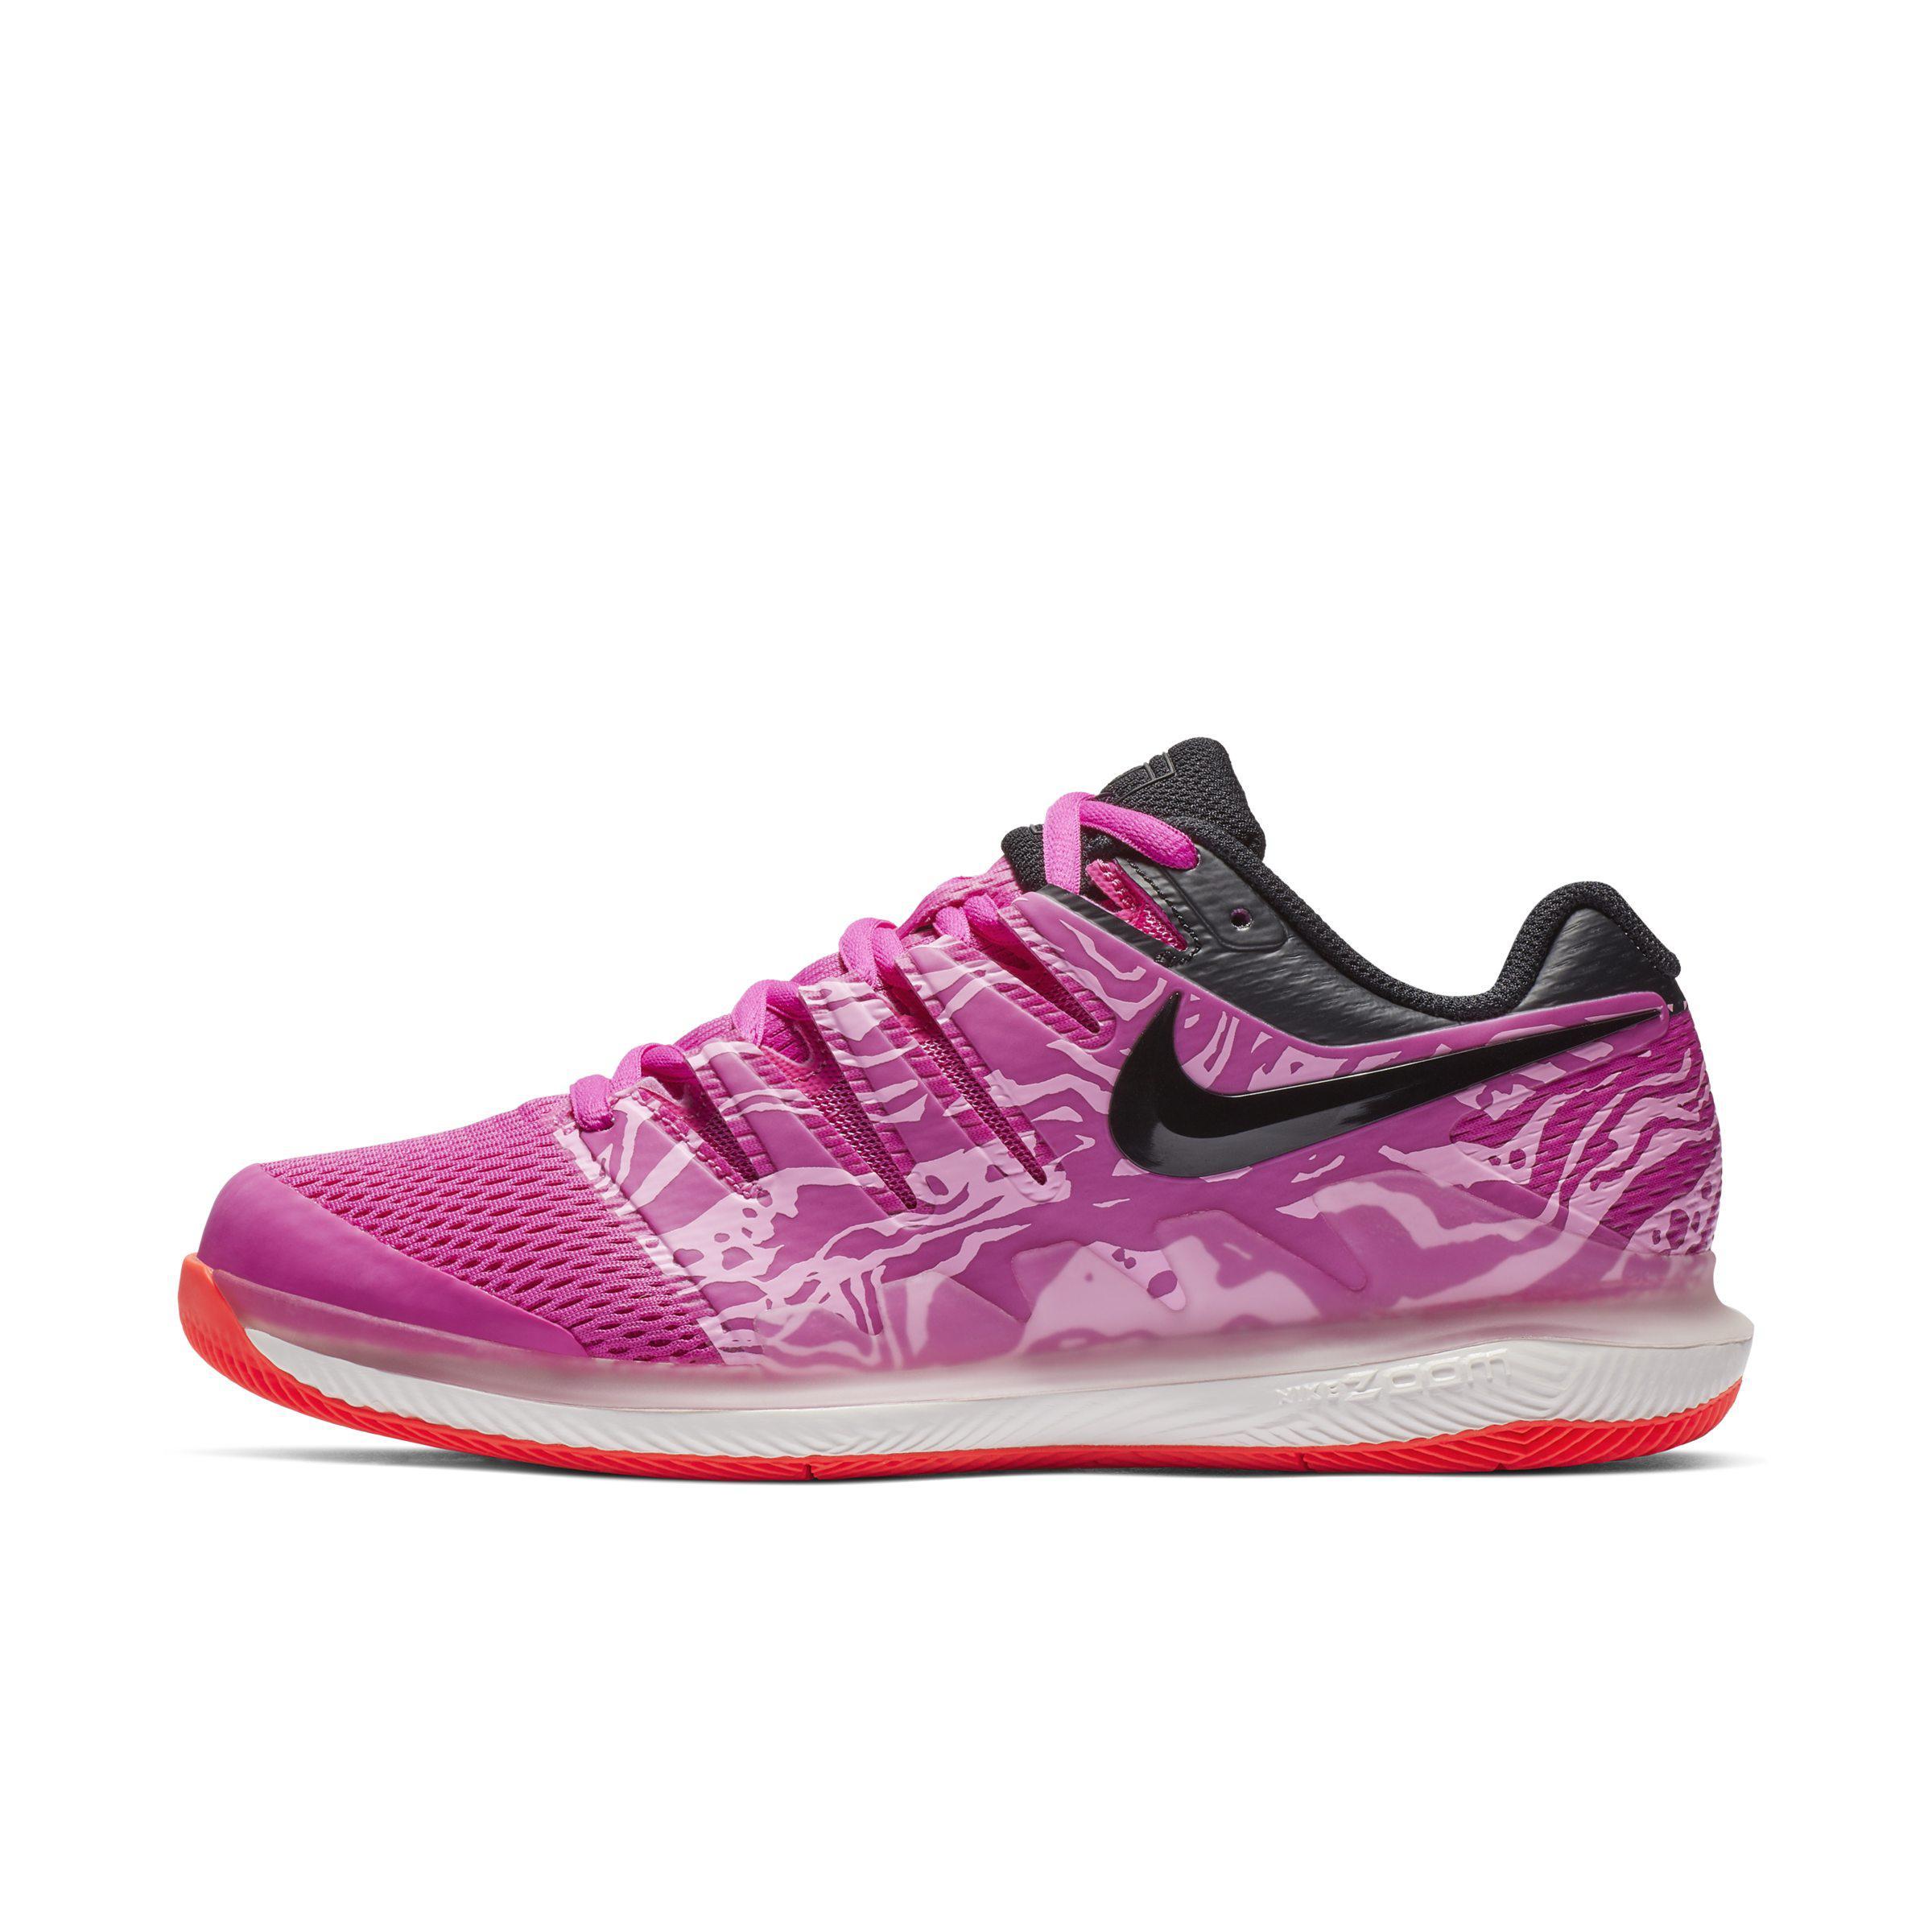 c8c3274e66e07 Nike Court Air Zoom Vapor X Hard Court Tennis Shoe in Purple - Lyst